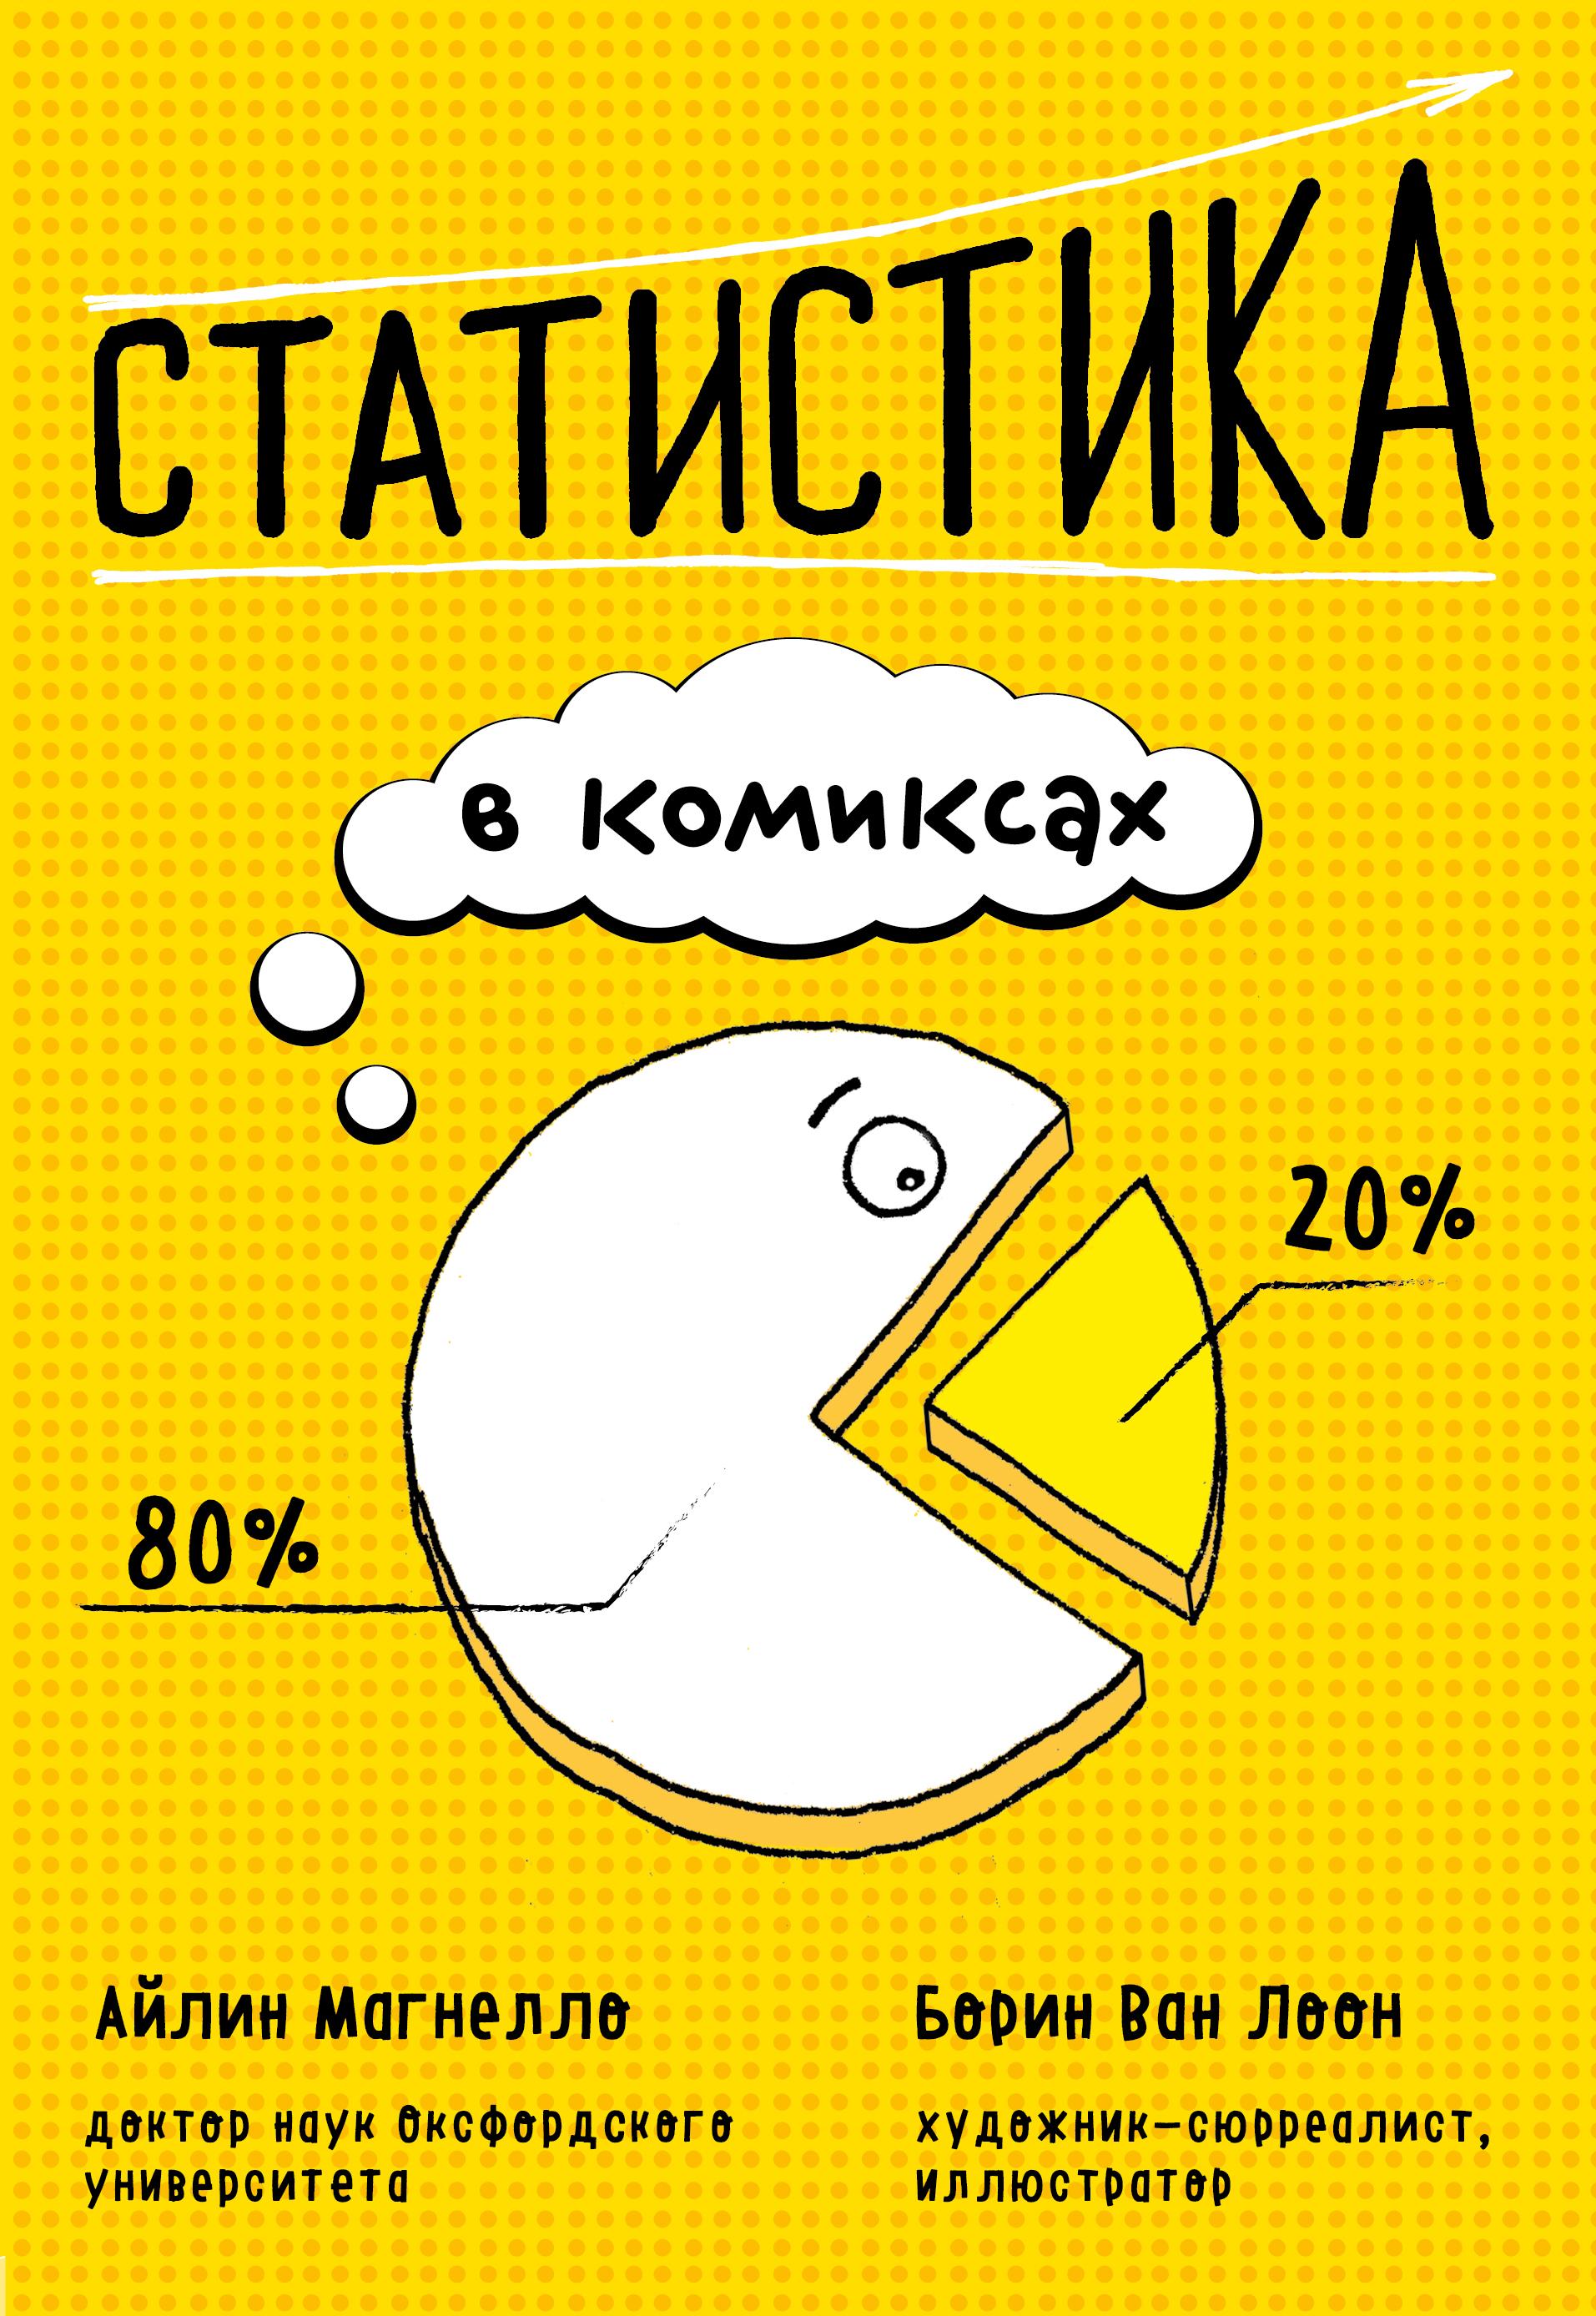 Эйлин Магнелло Статистика в комиксах